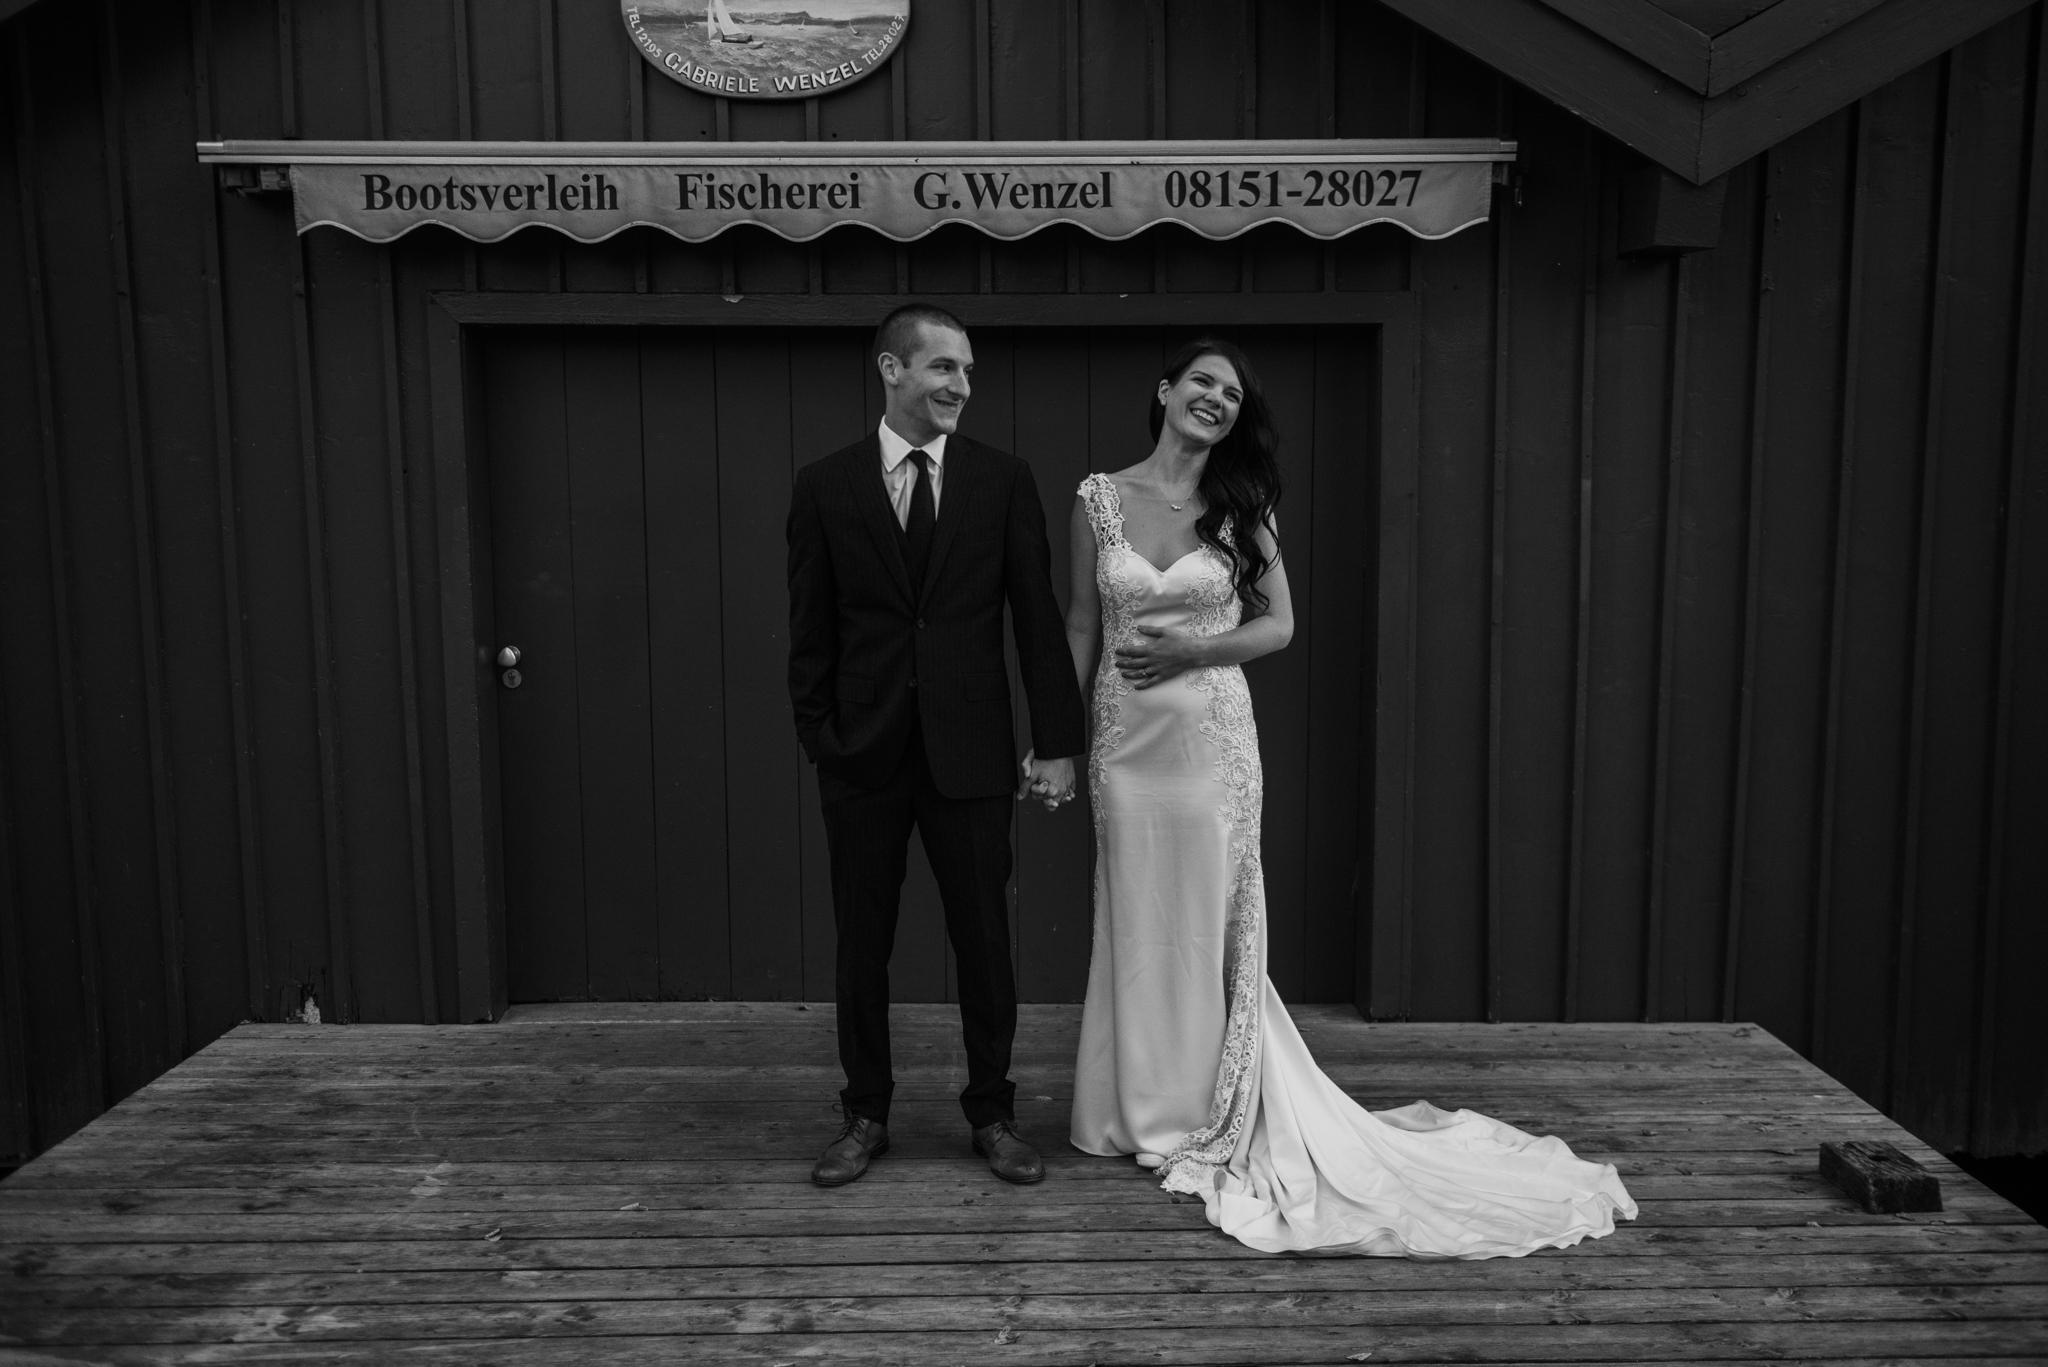 Munich Bridal Session - Munich Wedding Photographer